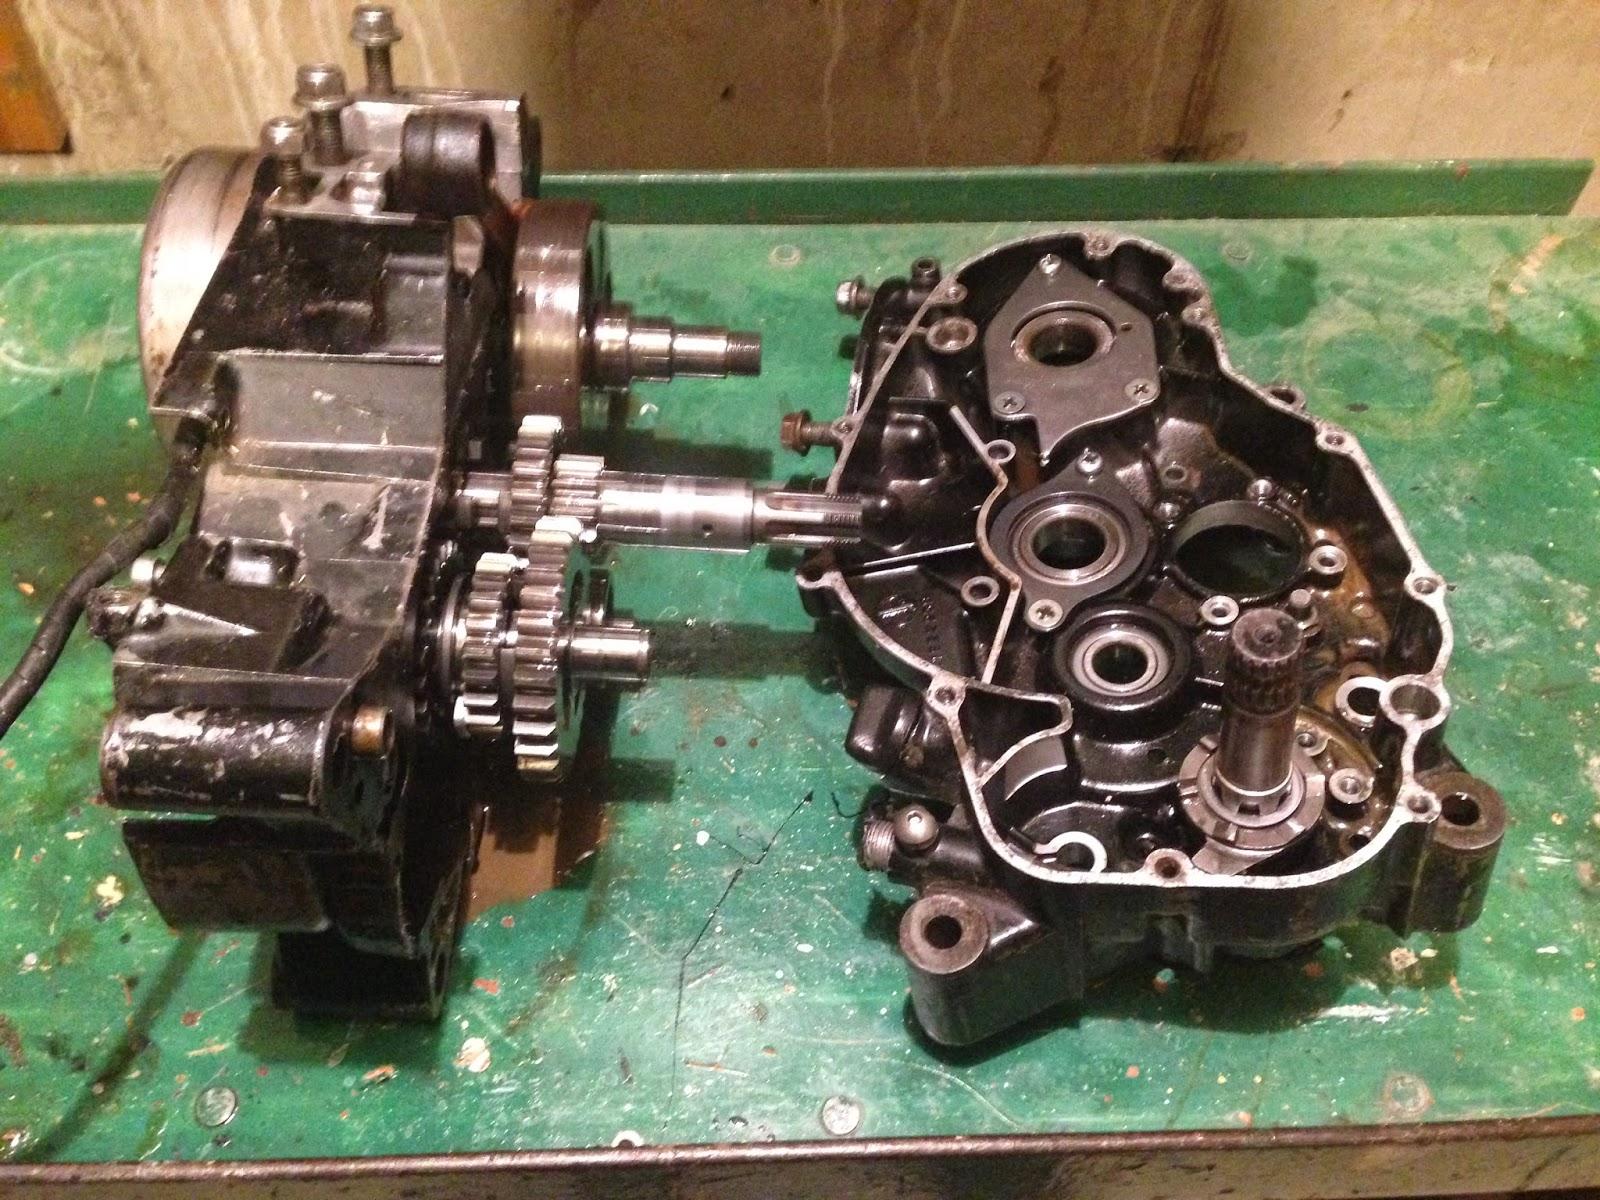 Part 2 - The Engine Rebuild